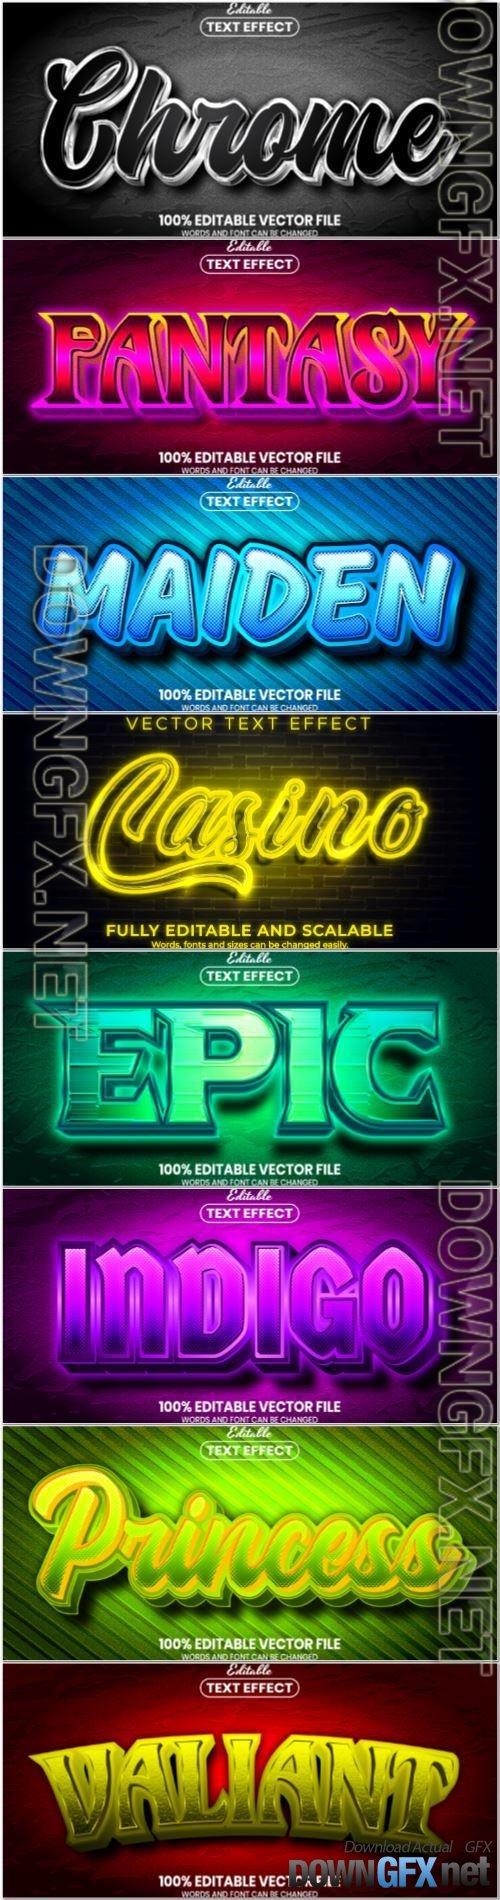 Set 3d editable text style effect vector vol 93